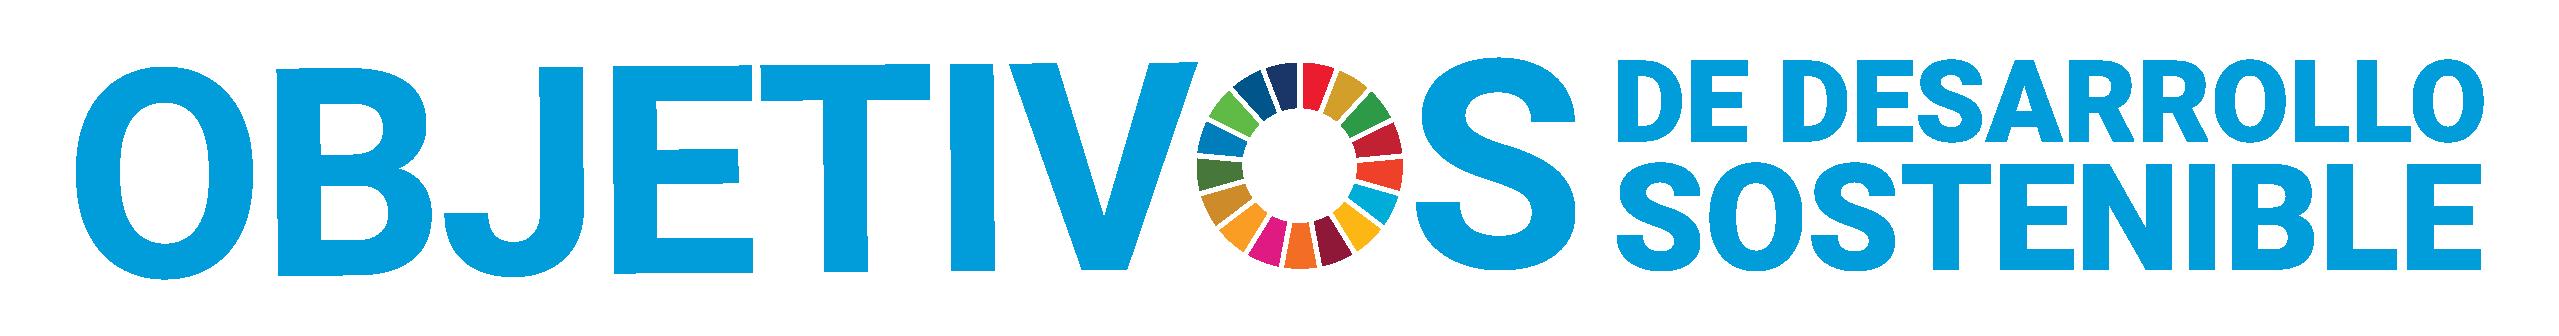 S_SDG_logo_without_UN_emblem_horizontal_Transparent_WEB.png